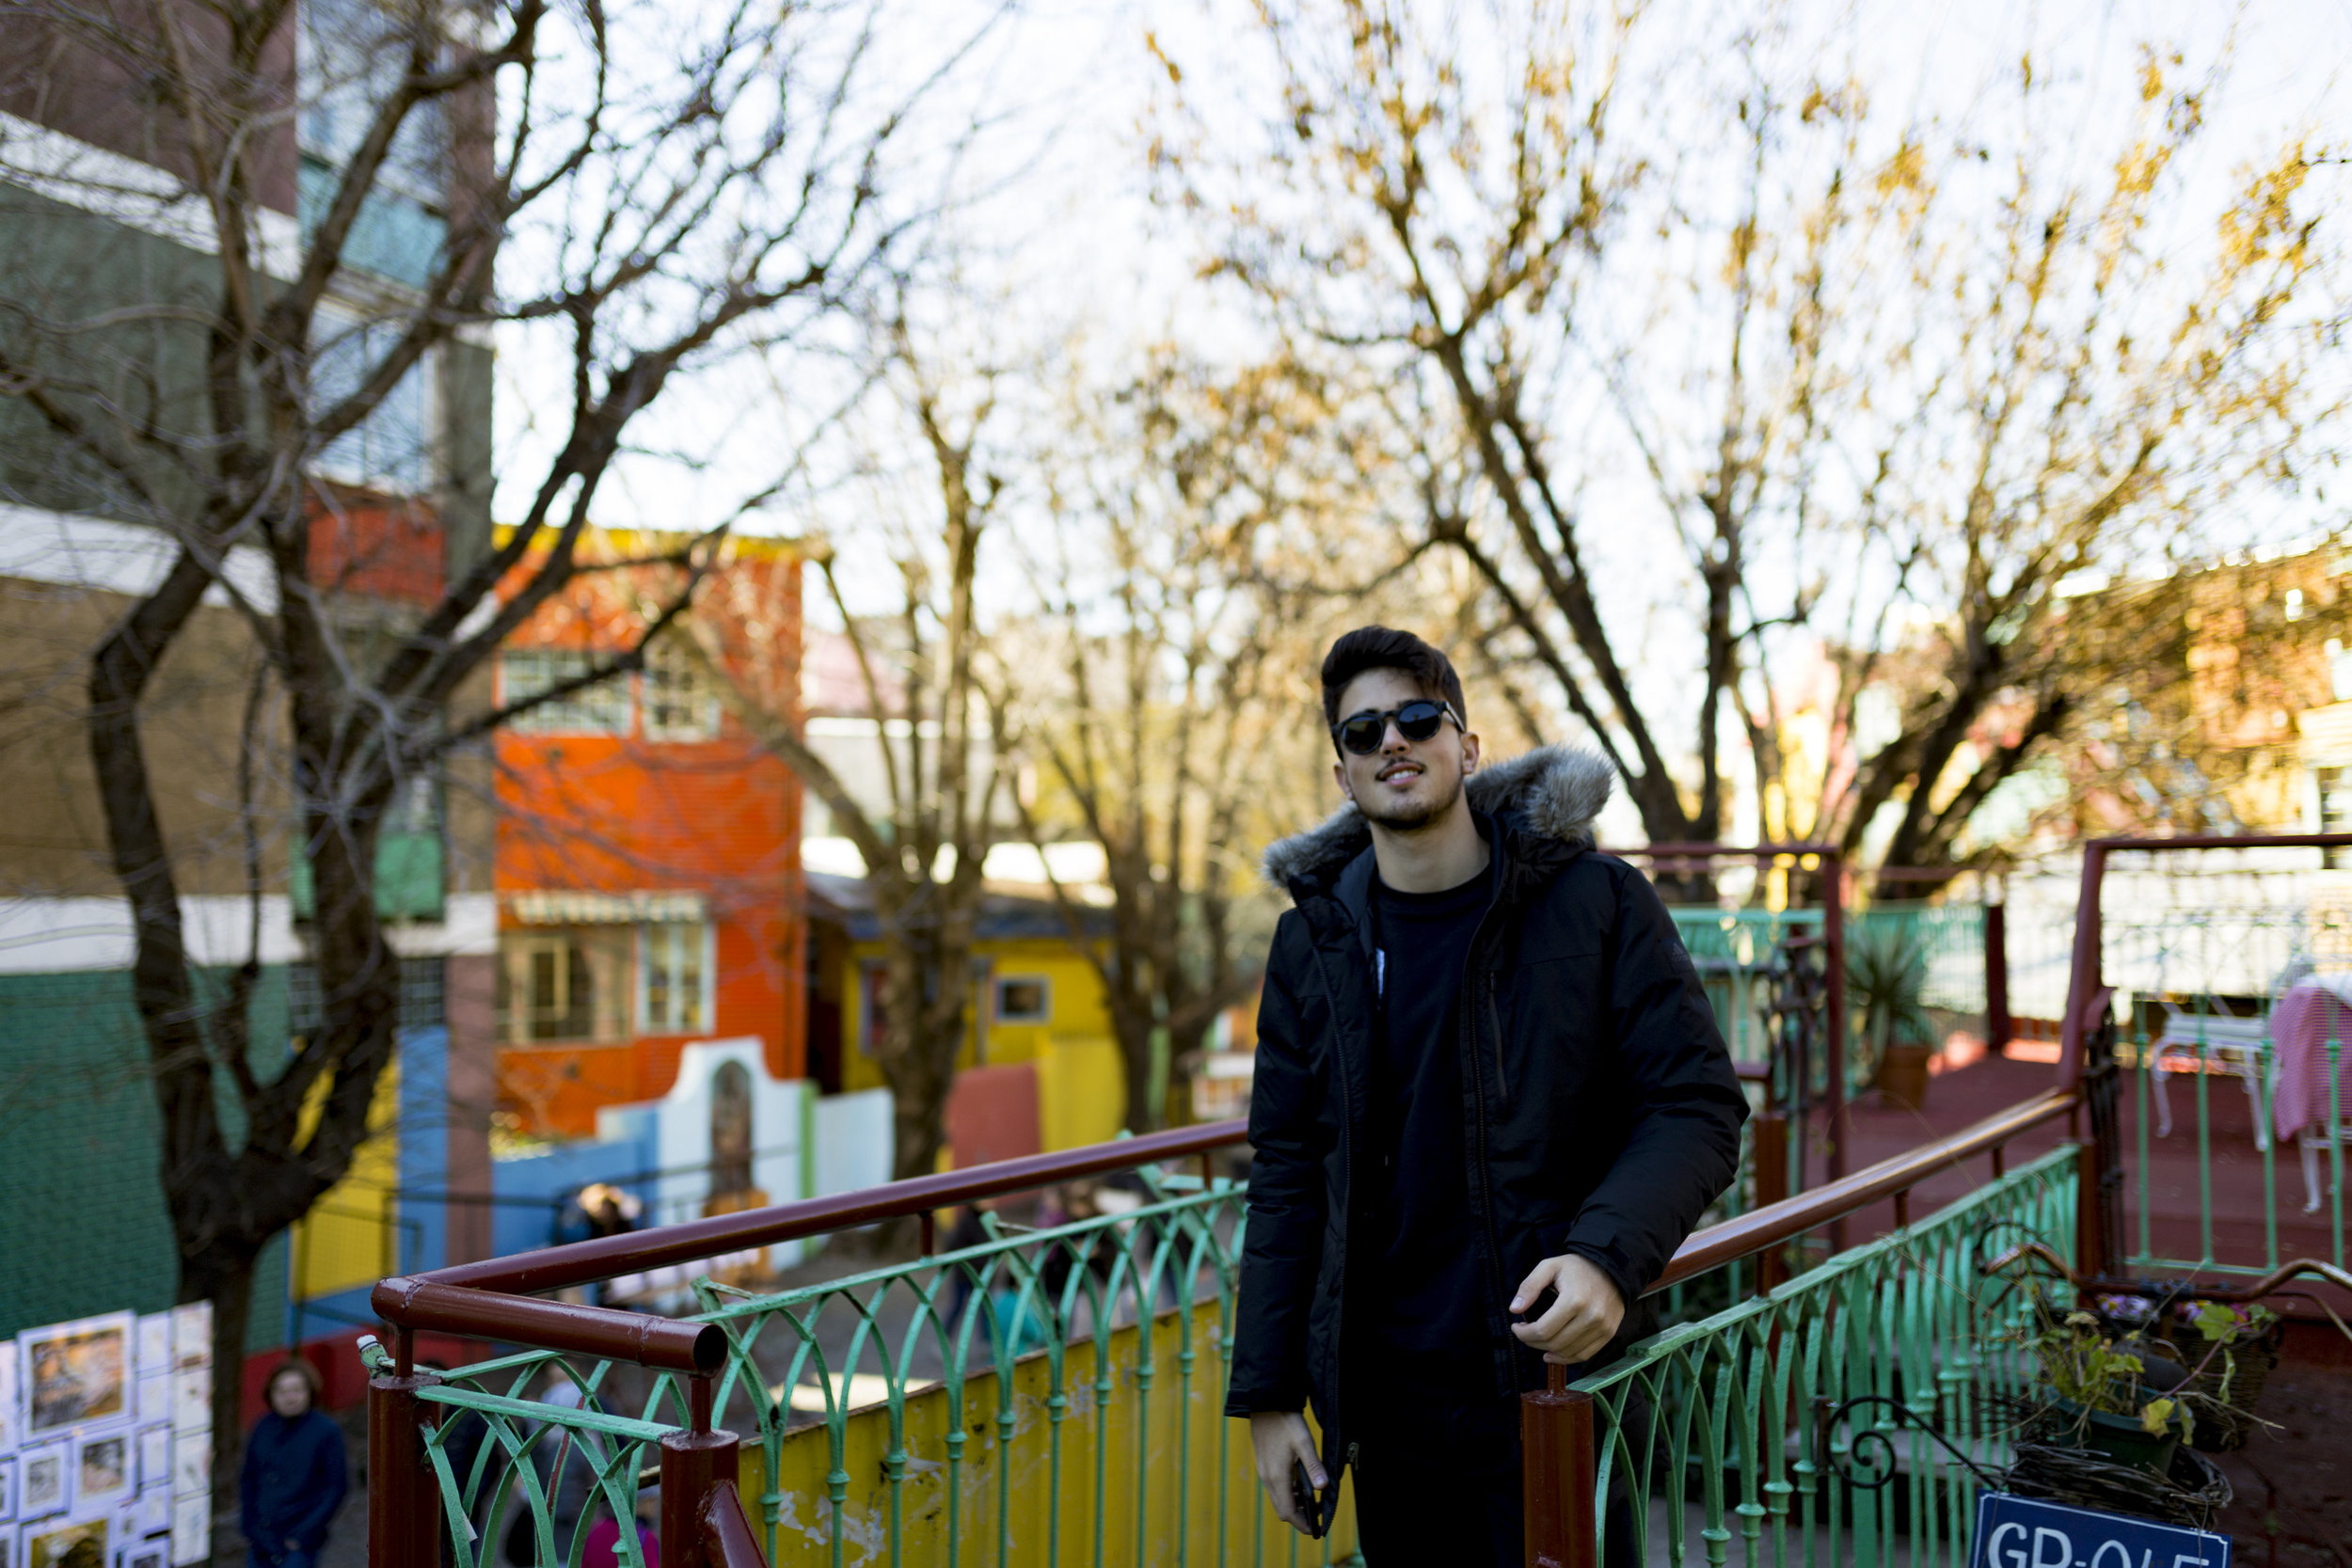 Fotos da Fotografa Jadna Perfil-Fotos da Fotografa Jadna Perfil-0004.jpg